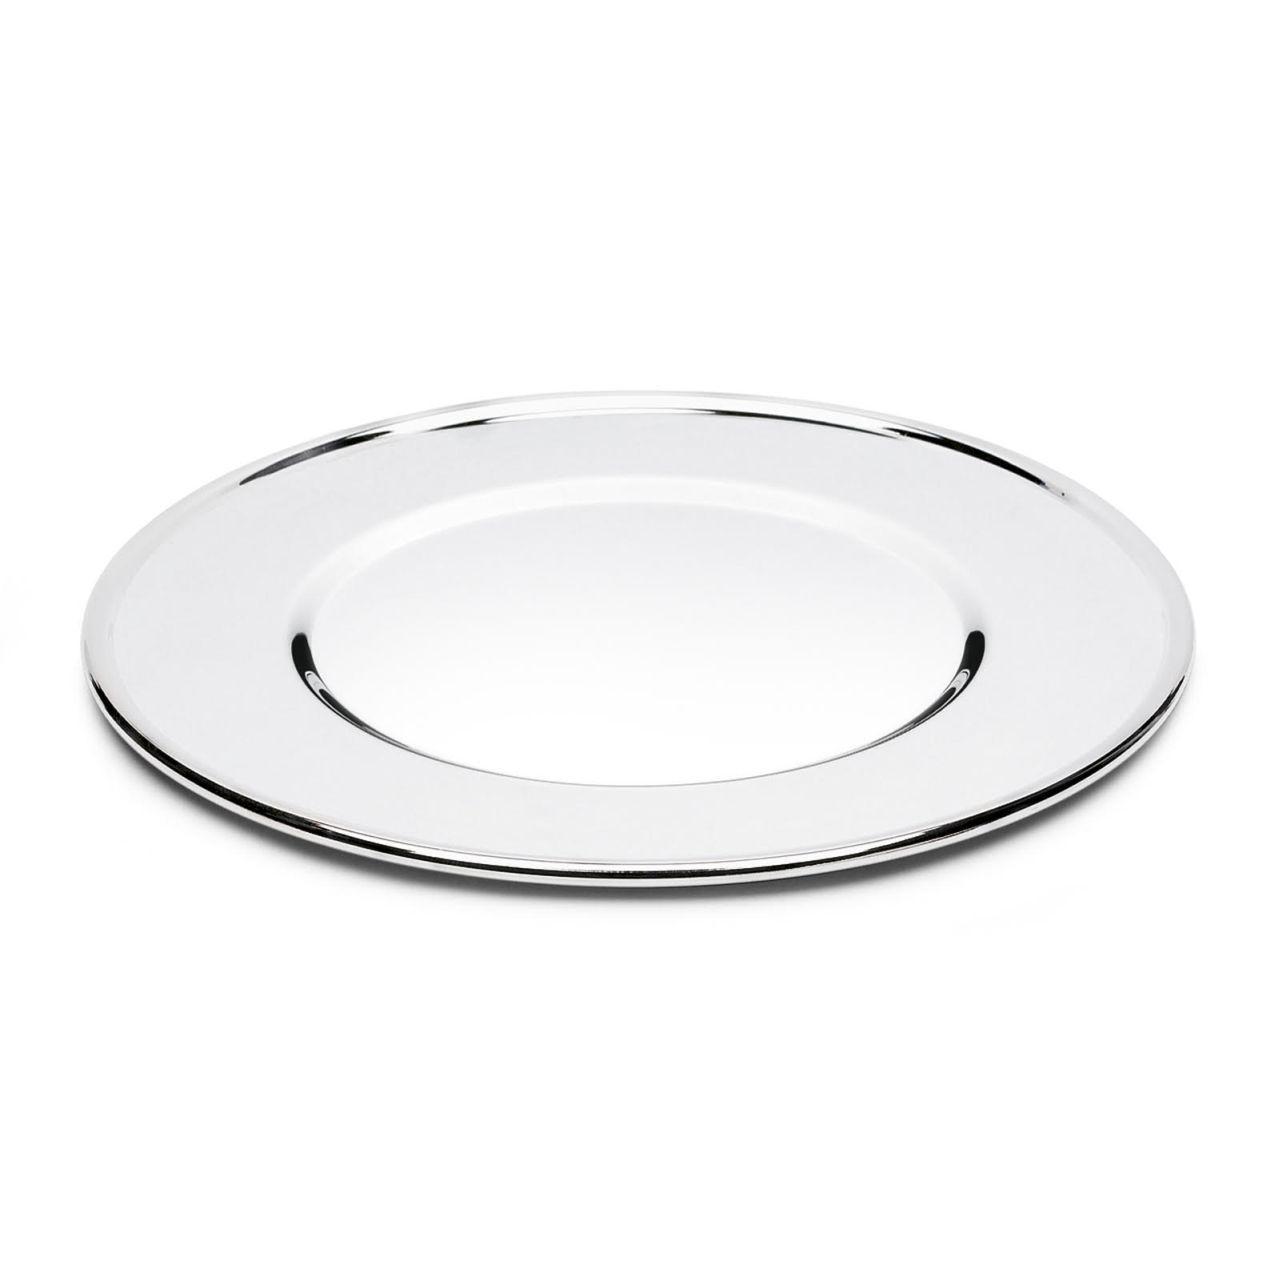 Sottopiatto liscio argentato argento 10 microns stile Cardinale cm.0,5h diam.31,5